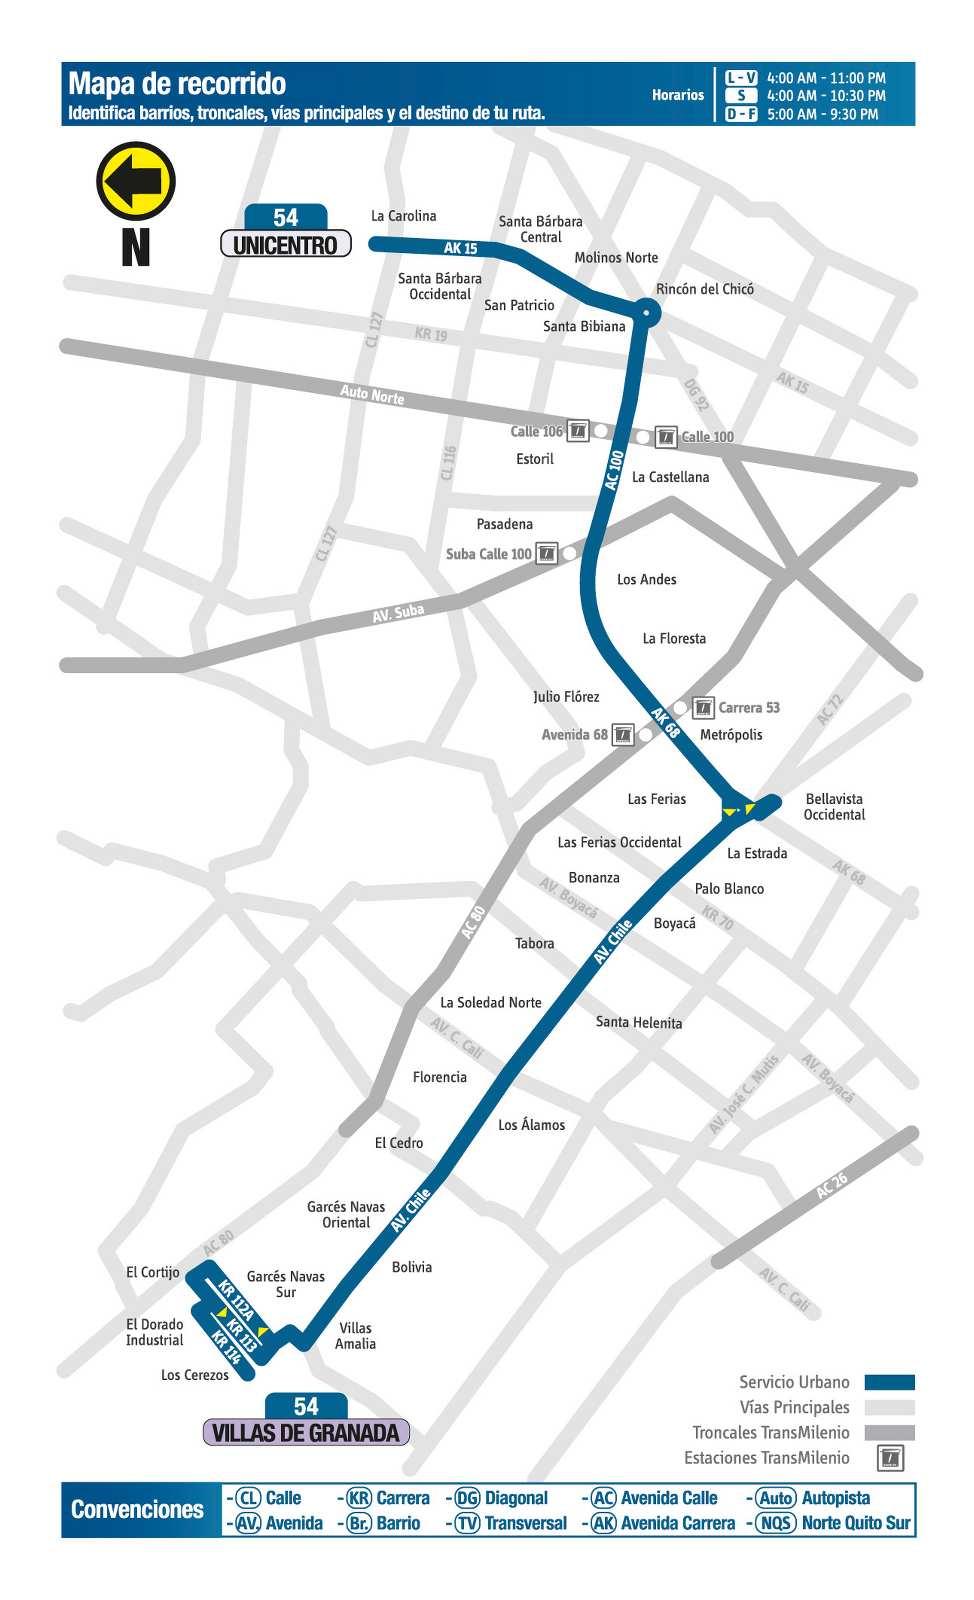 Ruta SITP: 54 Villas de Granada ↔ Unicentro (mapa)